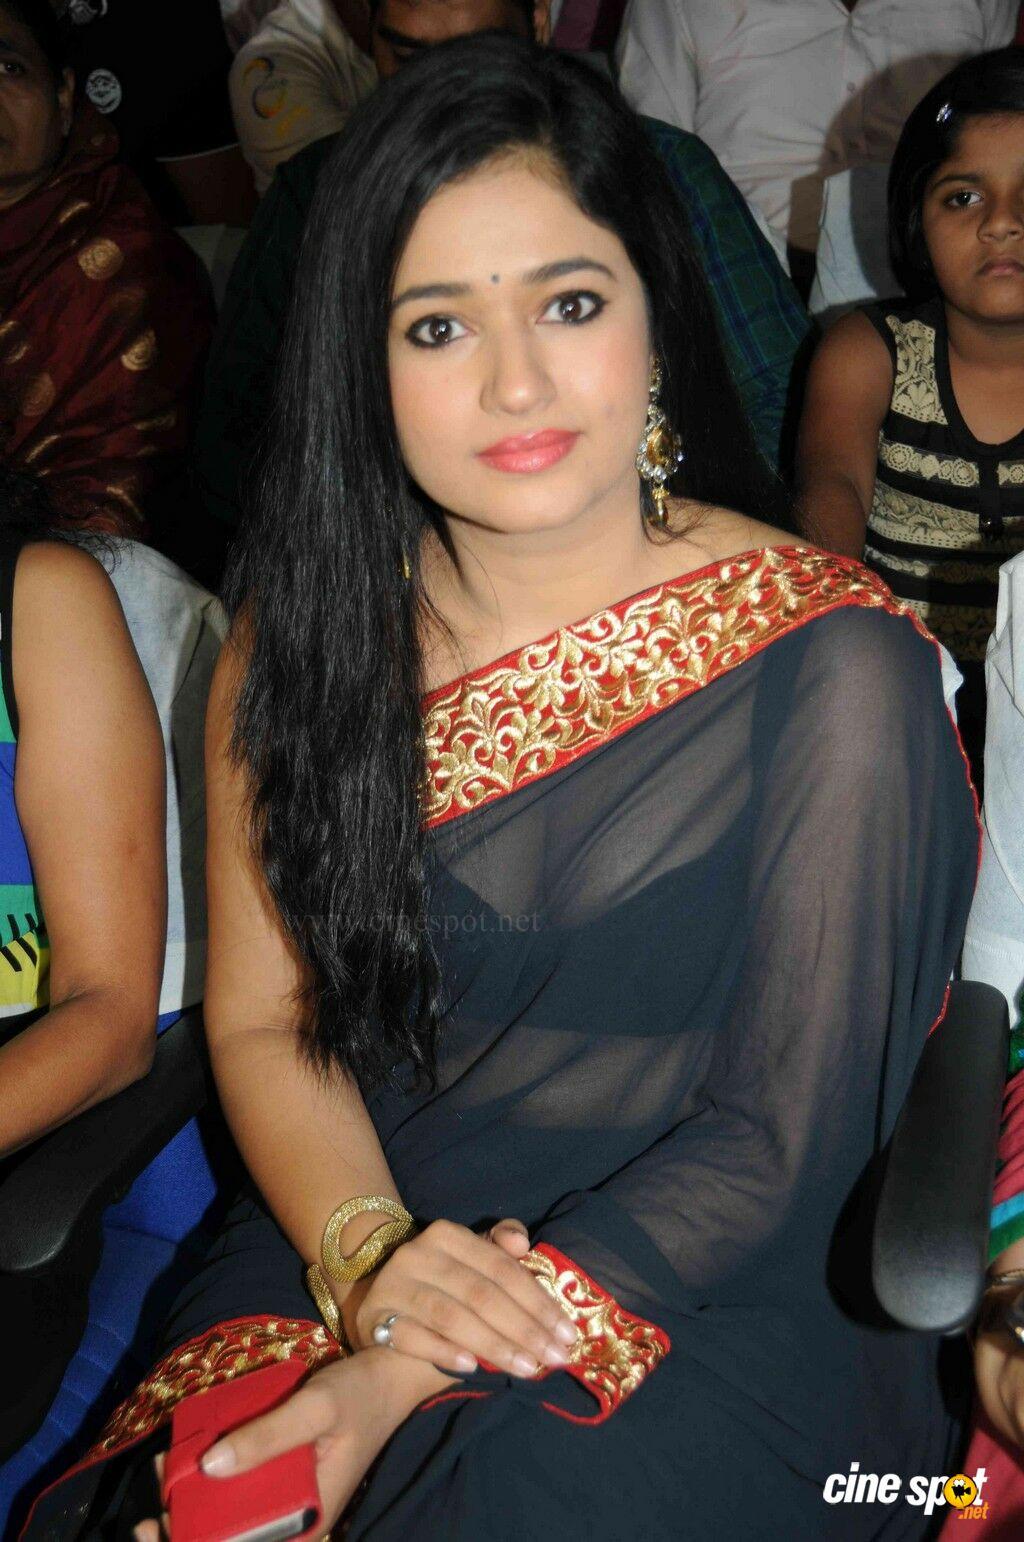 Punjabi Beautiful Girl Hd Wallpaper Pretty Poonam Bajwa Amazing Photo Collection Facts N